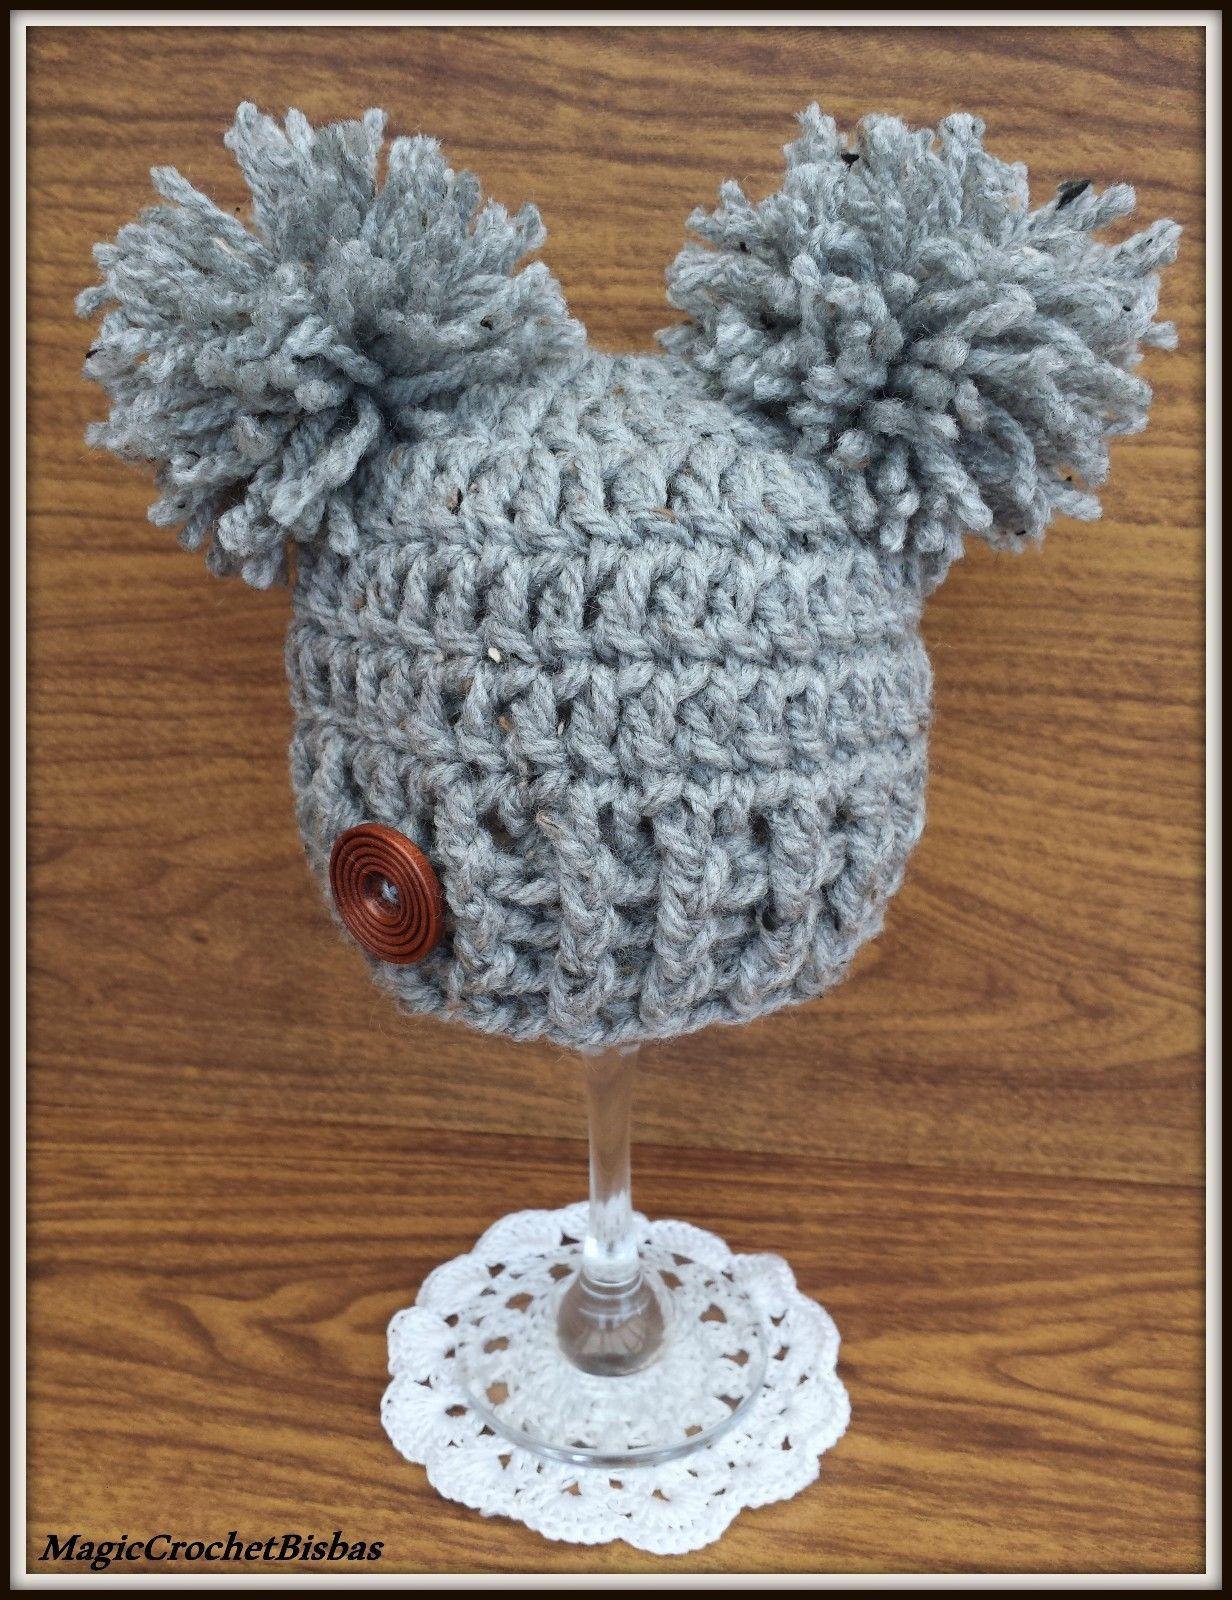 6 GBP - Crochet Little Pompom Hat Photo Prop Gift Baby Shower Hat ... 550c60c8dc9